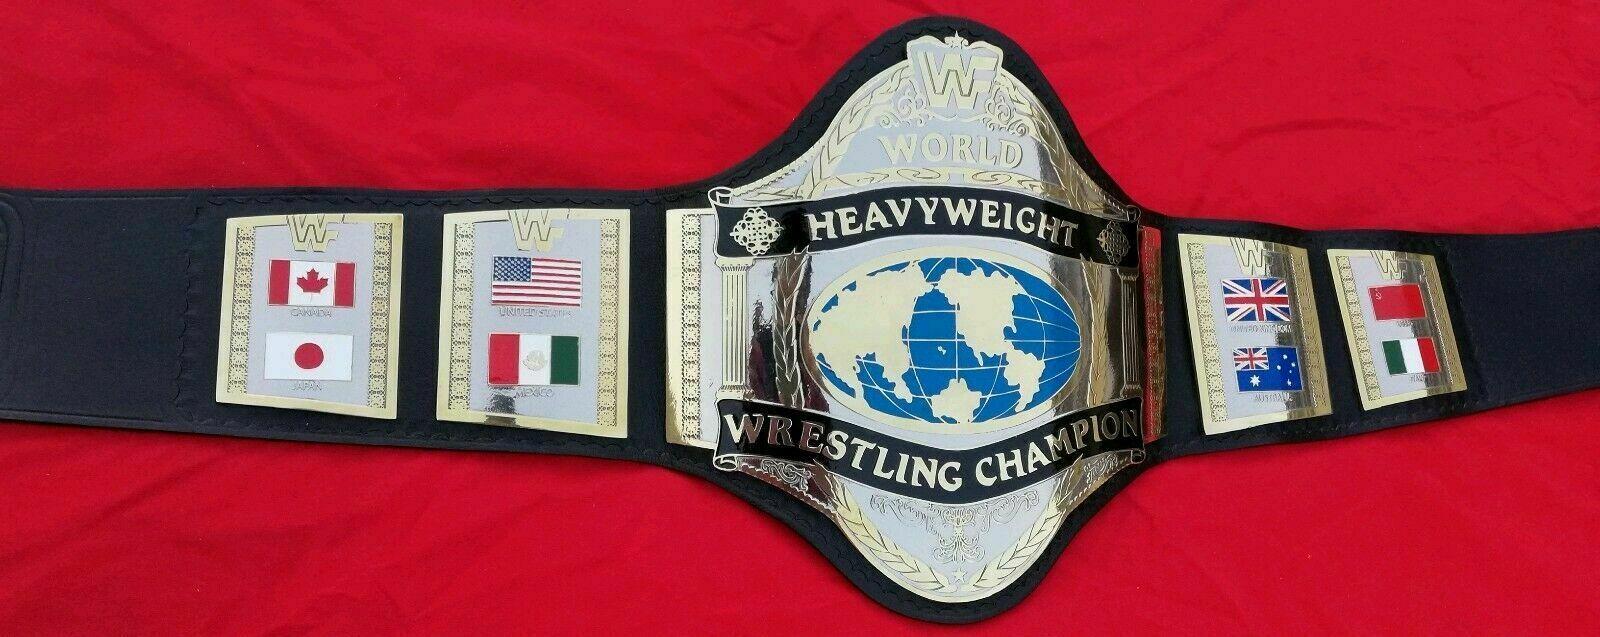 WWF Hulk Hogan 86 World Heavyweight Championship Belt - $325